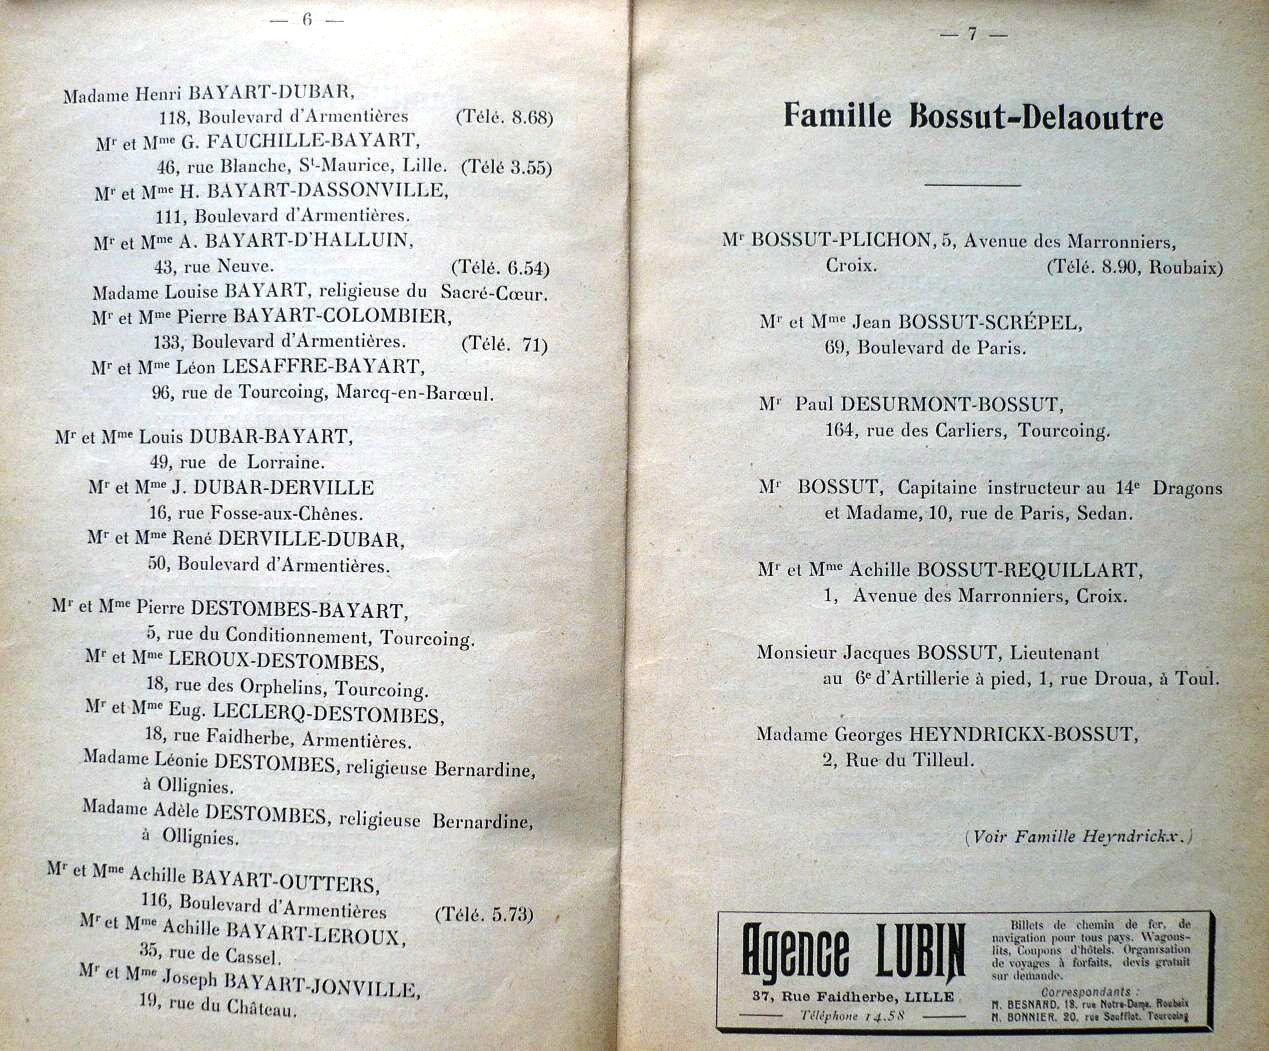 GrdesFamilles_1912-Bossut